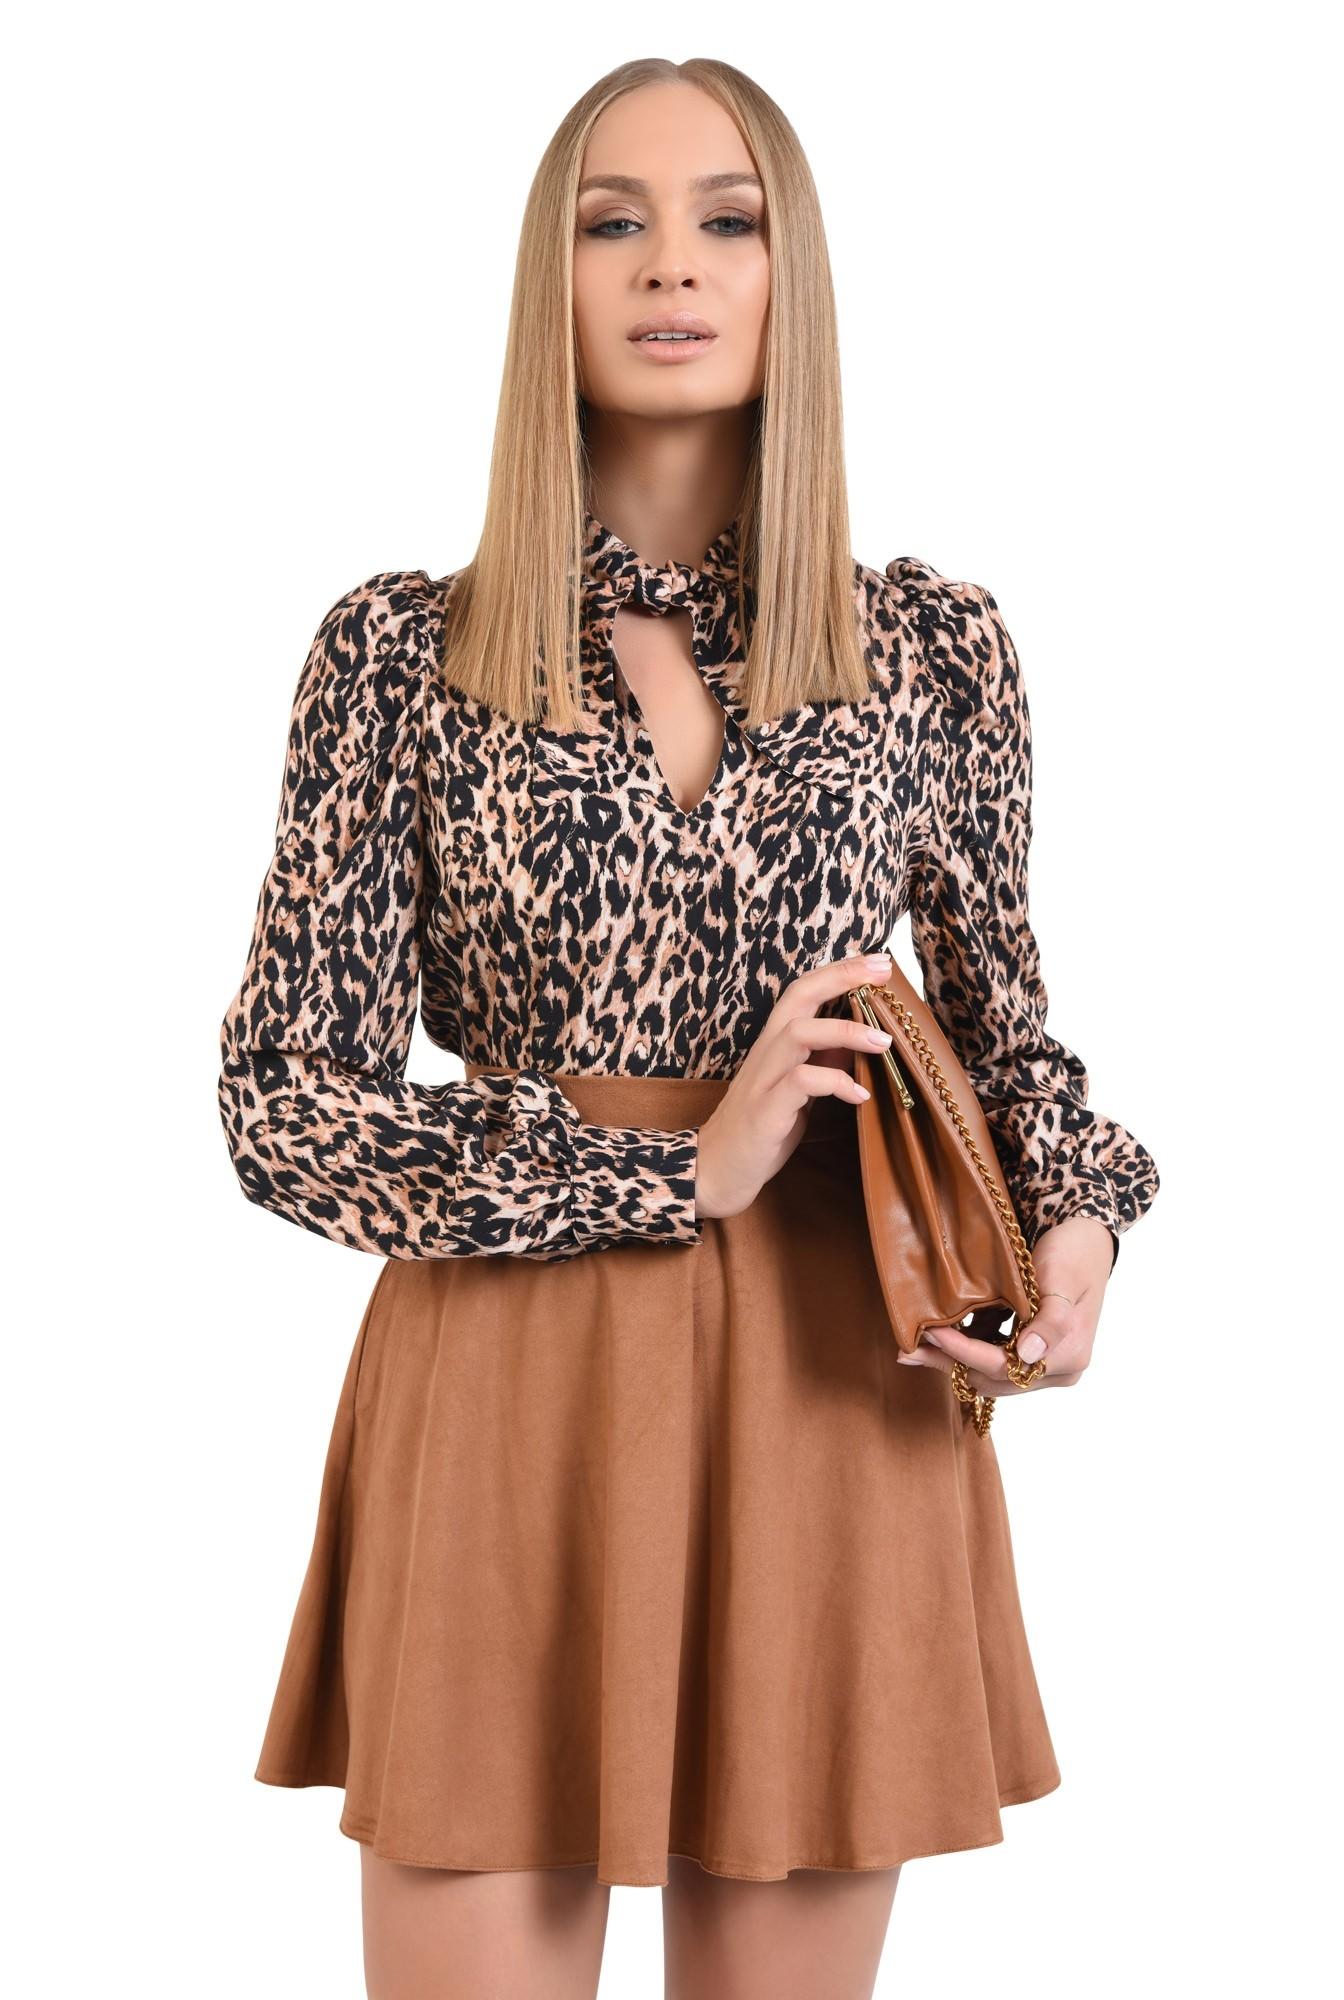 0 - bluza animal print, leopard, imprimeu, maneci lungi